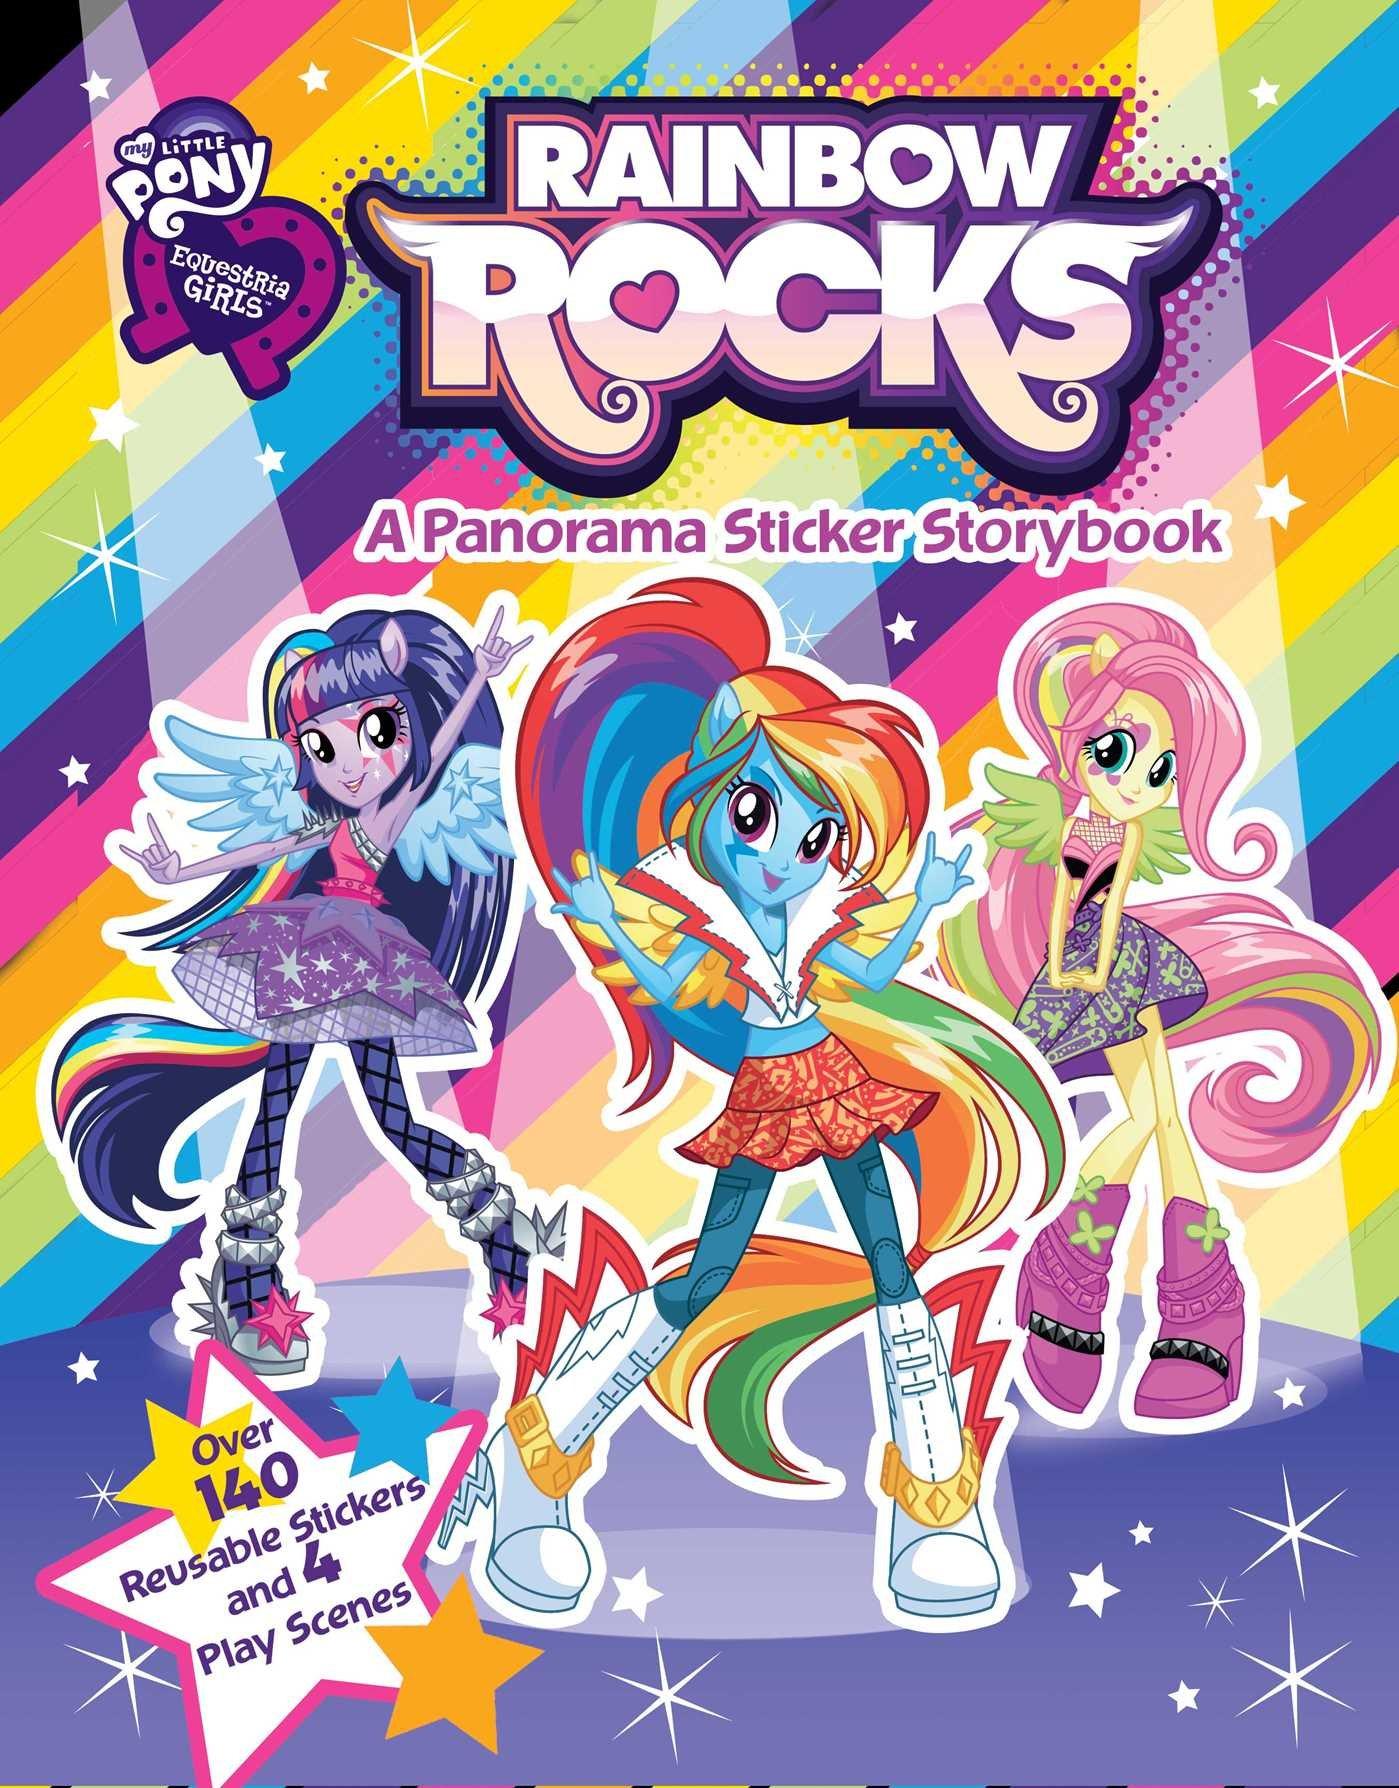 - My Little Pony Equestria Girls: Rainbow Rocks (3) (Panorama